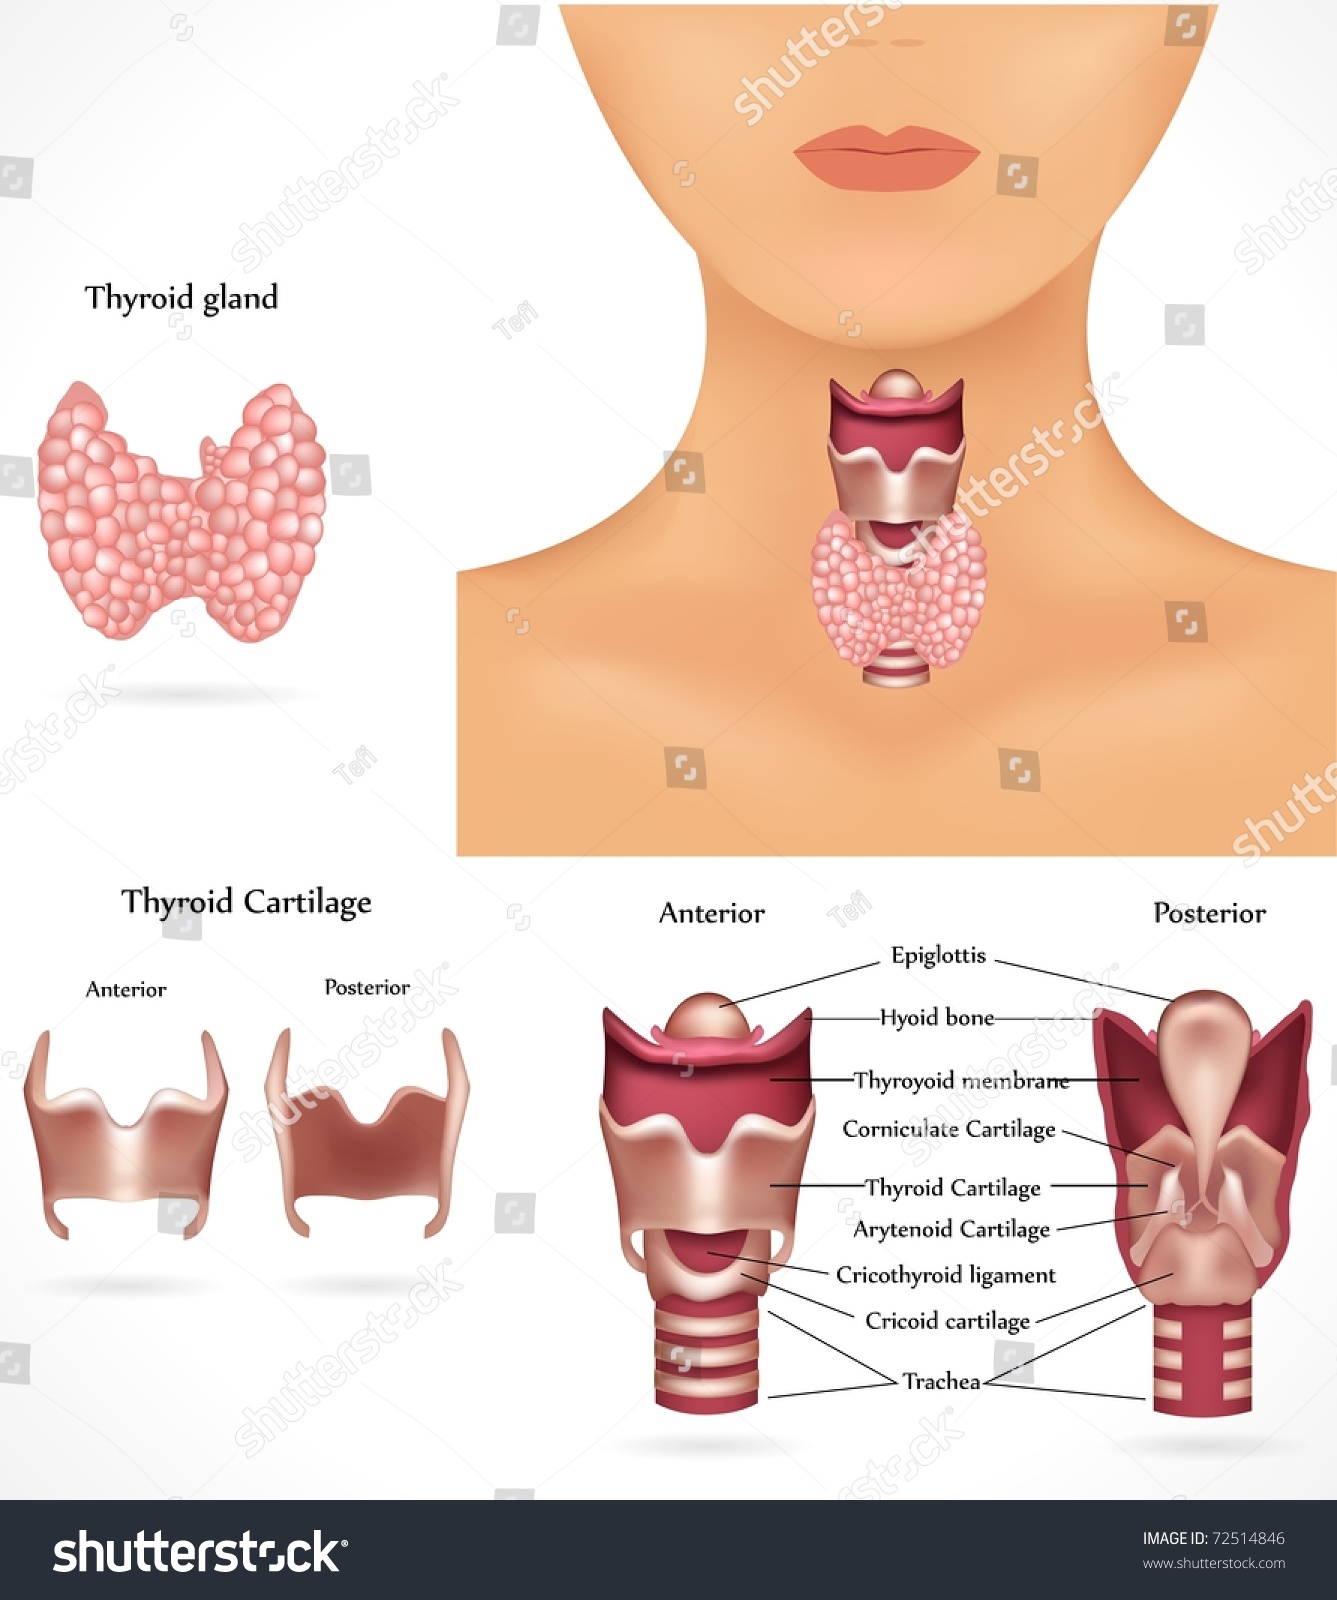 Thyroid Gland, Epiglottis, Trachea. Detailed Anatomy. Stock Vector 72514846 : Shutterstock